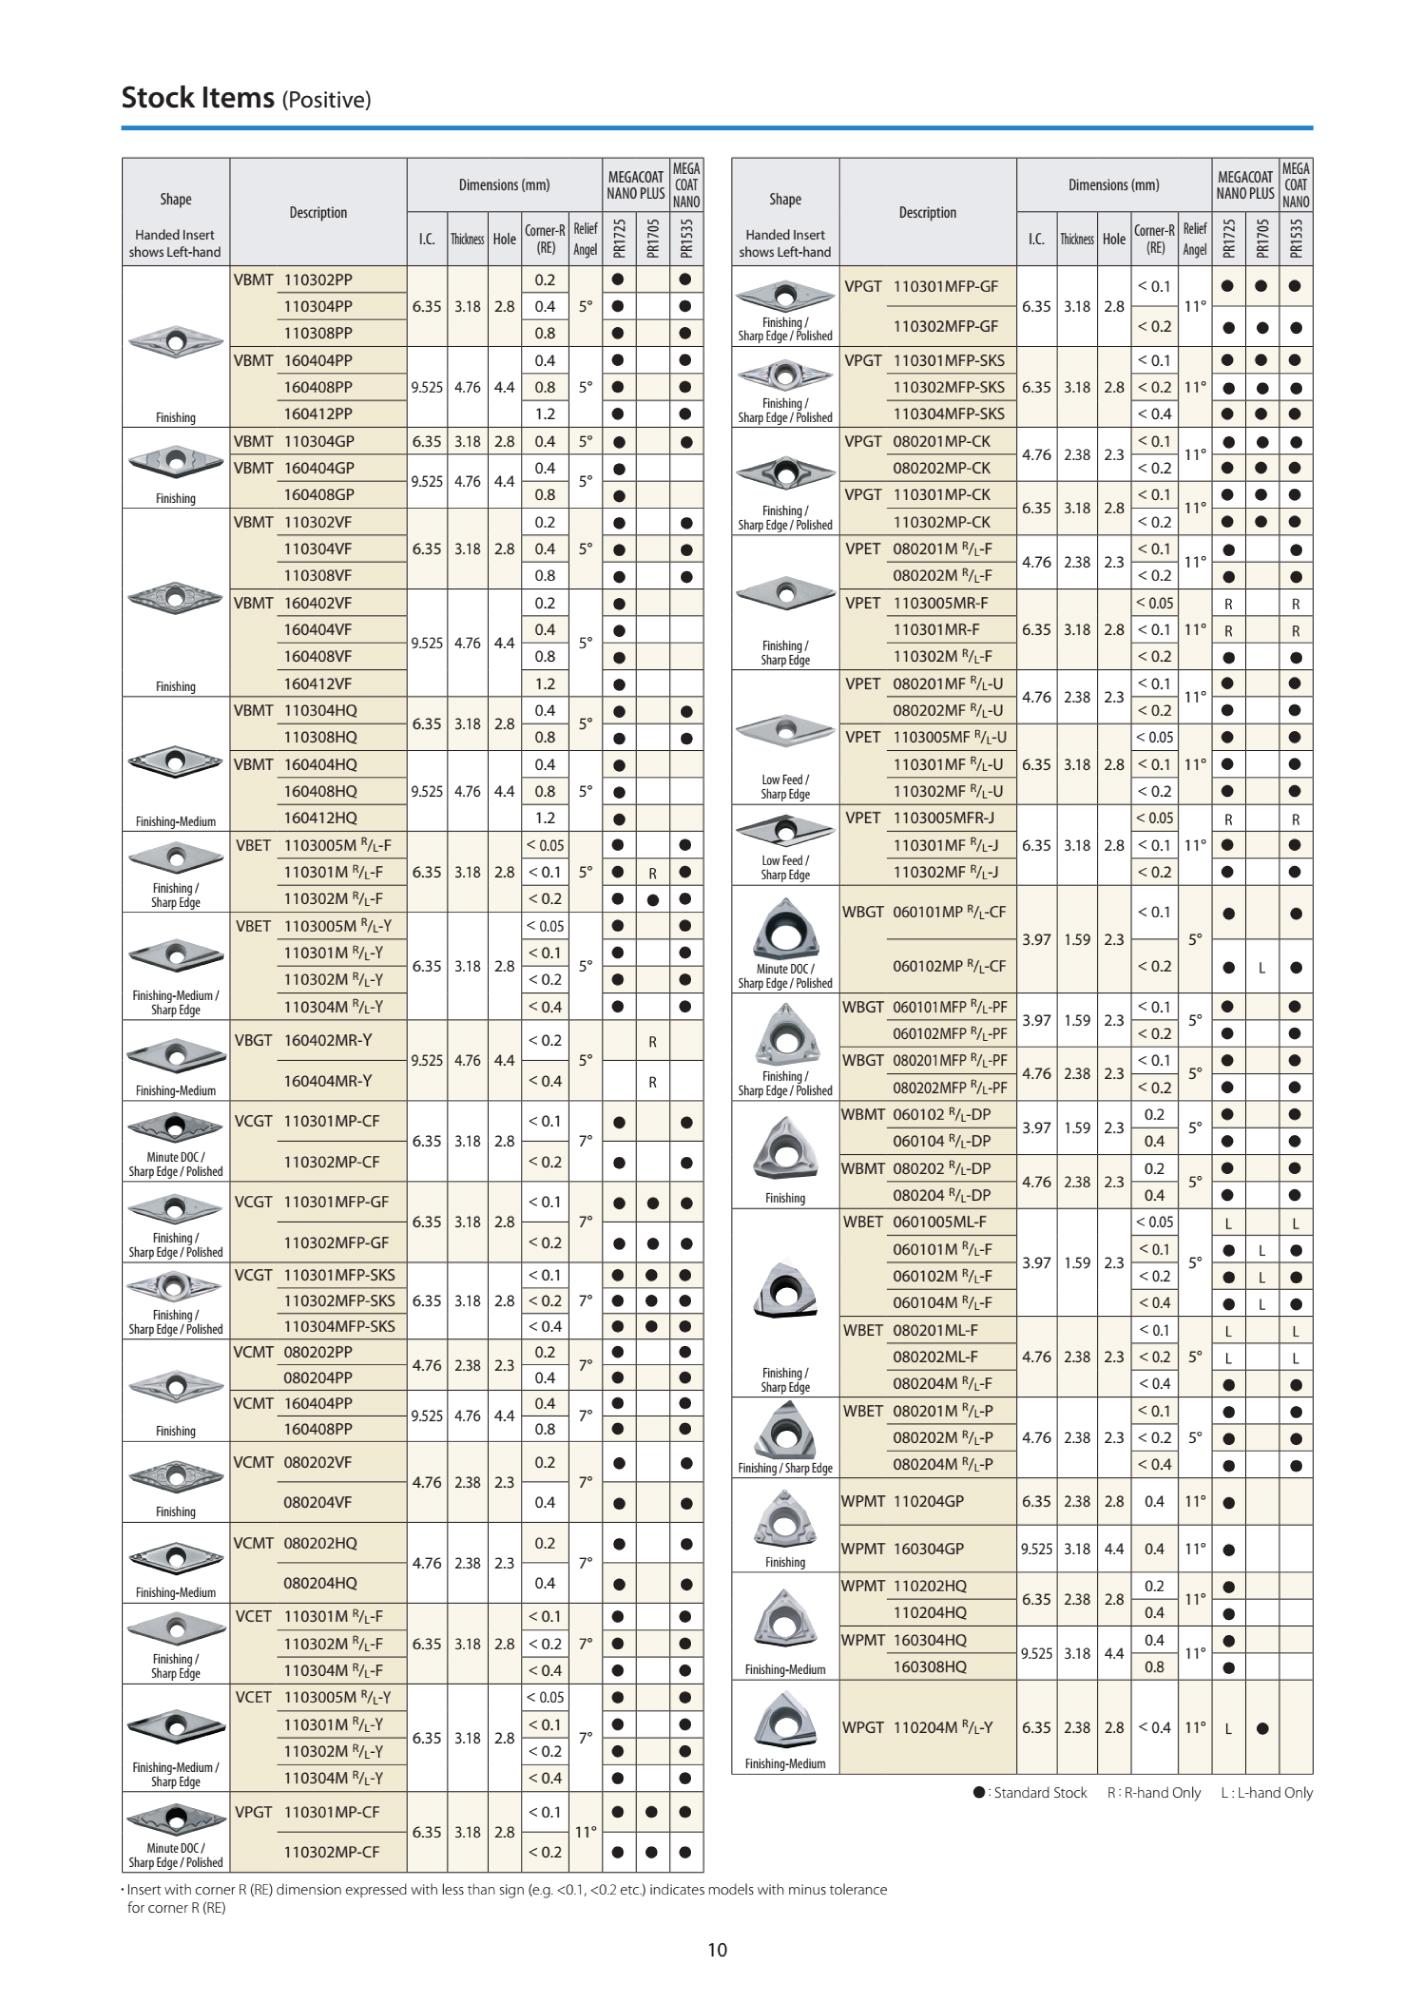 KYOCERA MỞ RỘNG DẢI INSERT LỚP PHỦ MỚI PR1705 MEGACOAT NANO PLUS 7